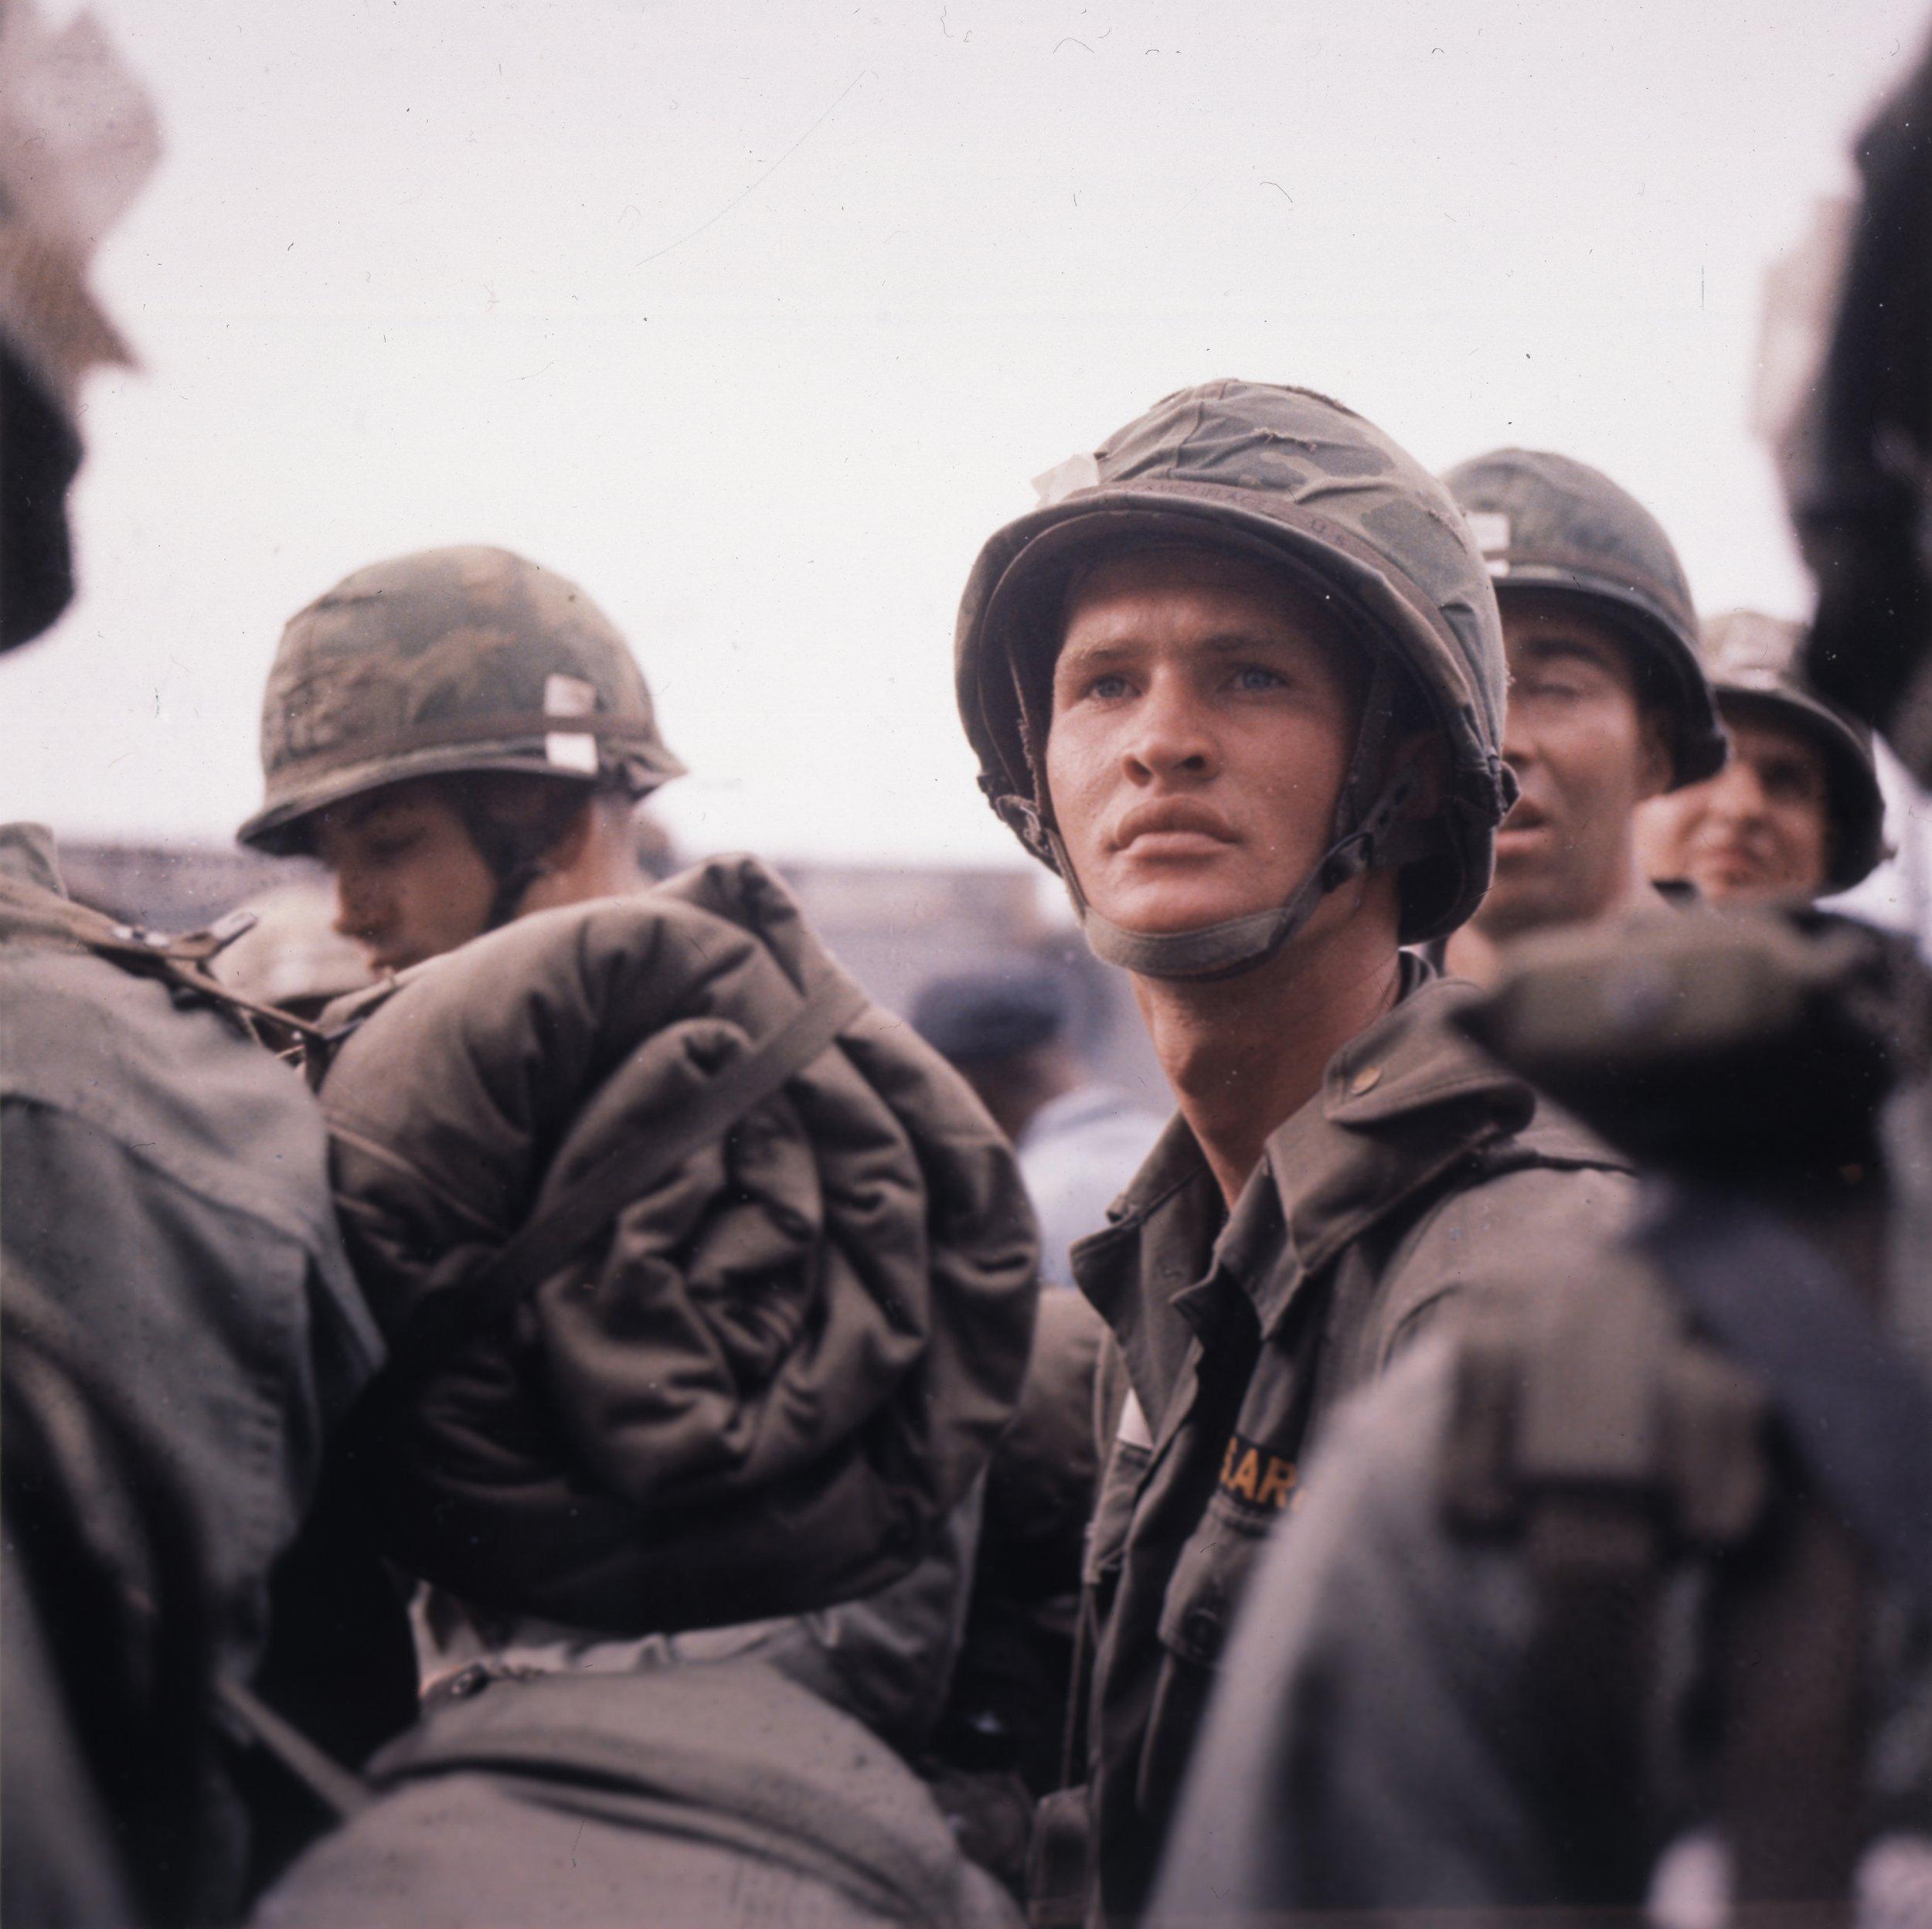 Ken Burns' new Vietnam documentary dismisses the origins of the disastrous conflict